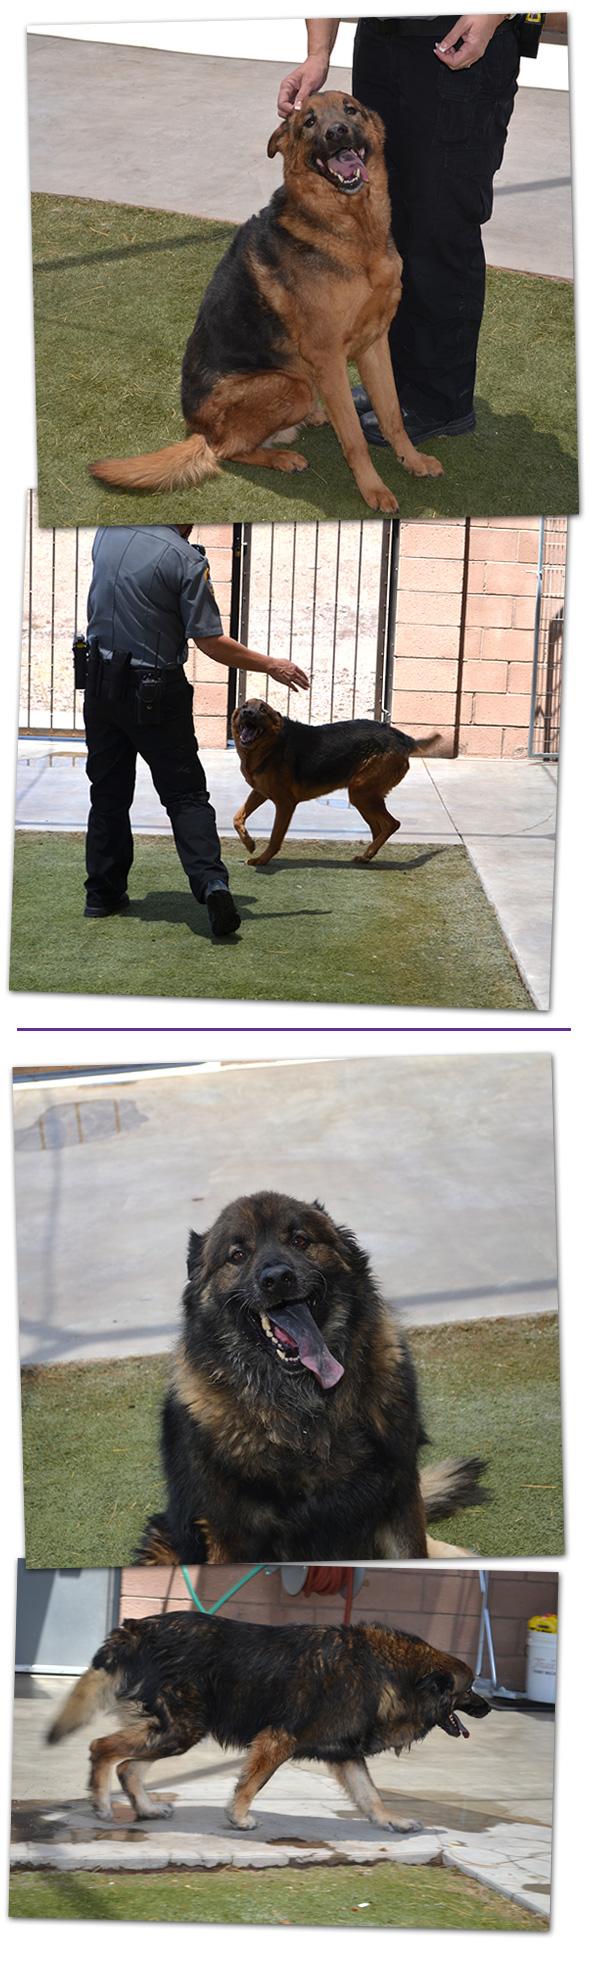 Adoptable Pet in Boulder City, NV - June 2014